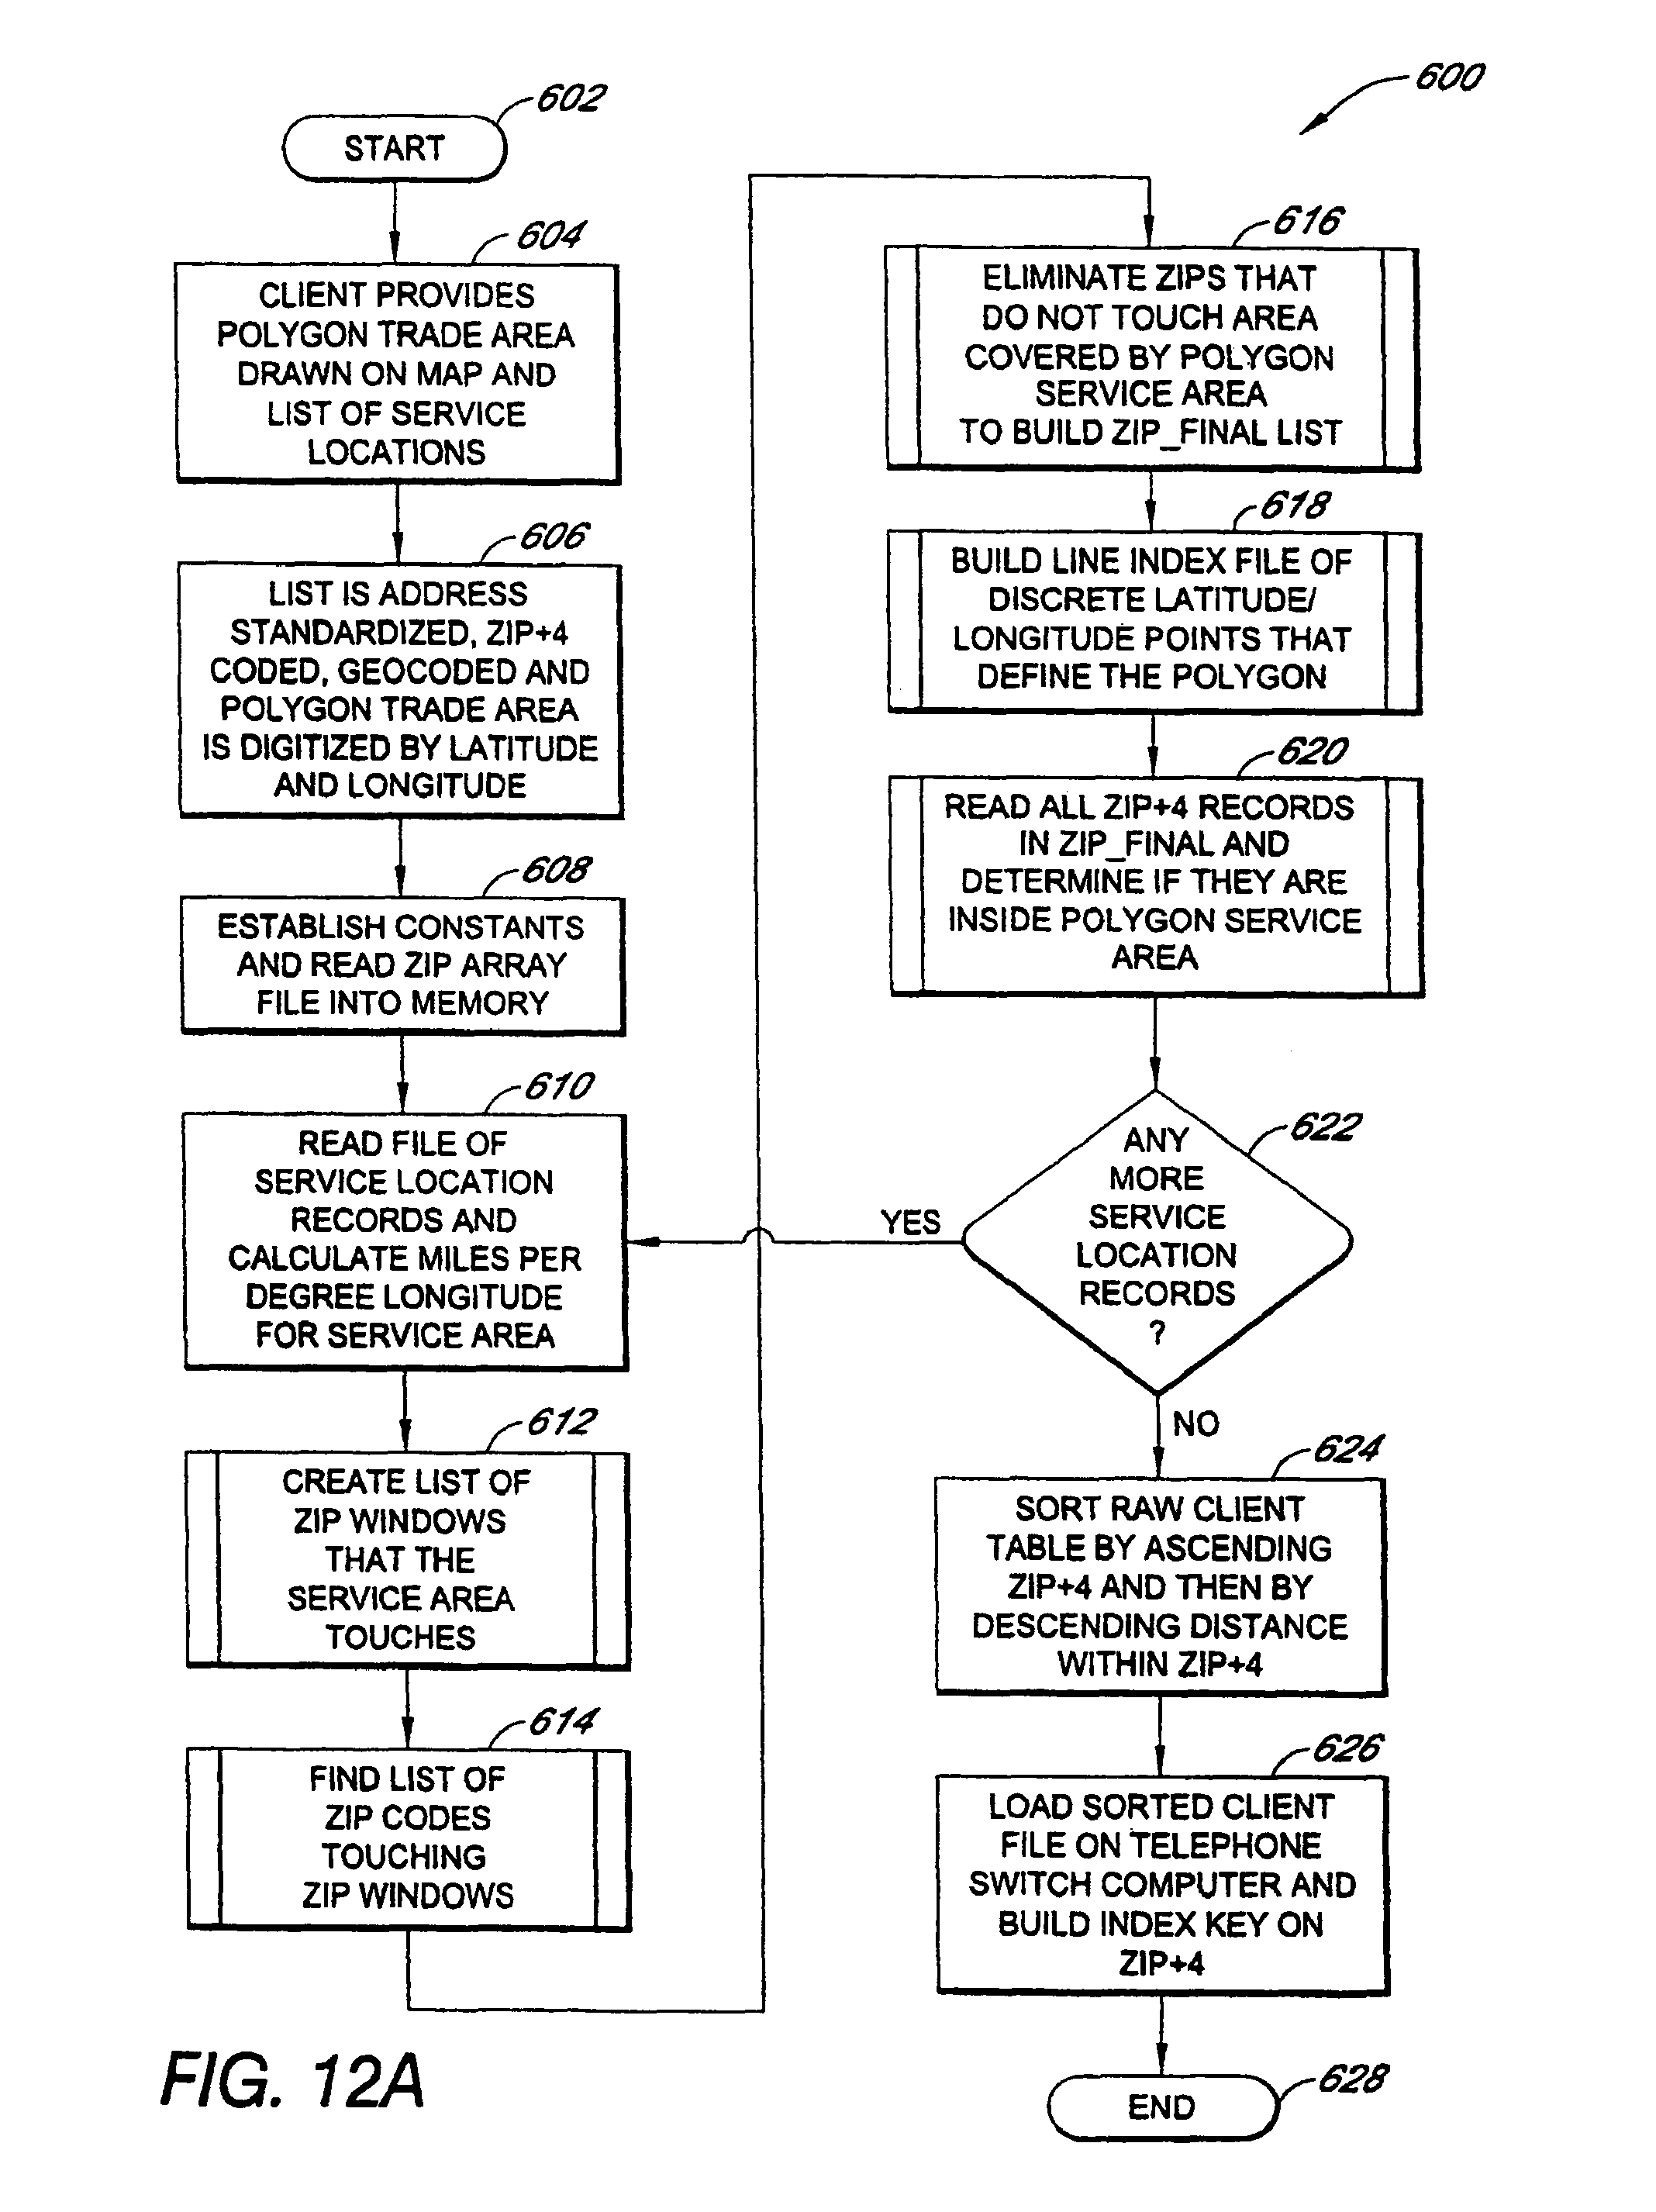 Patent US 8,363,814 B2